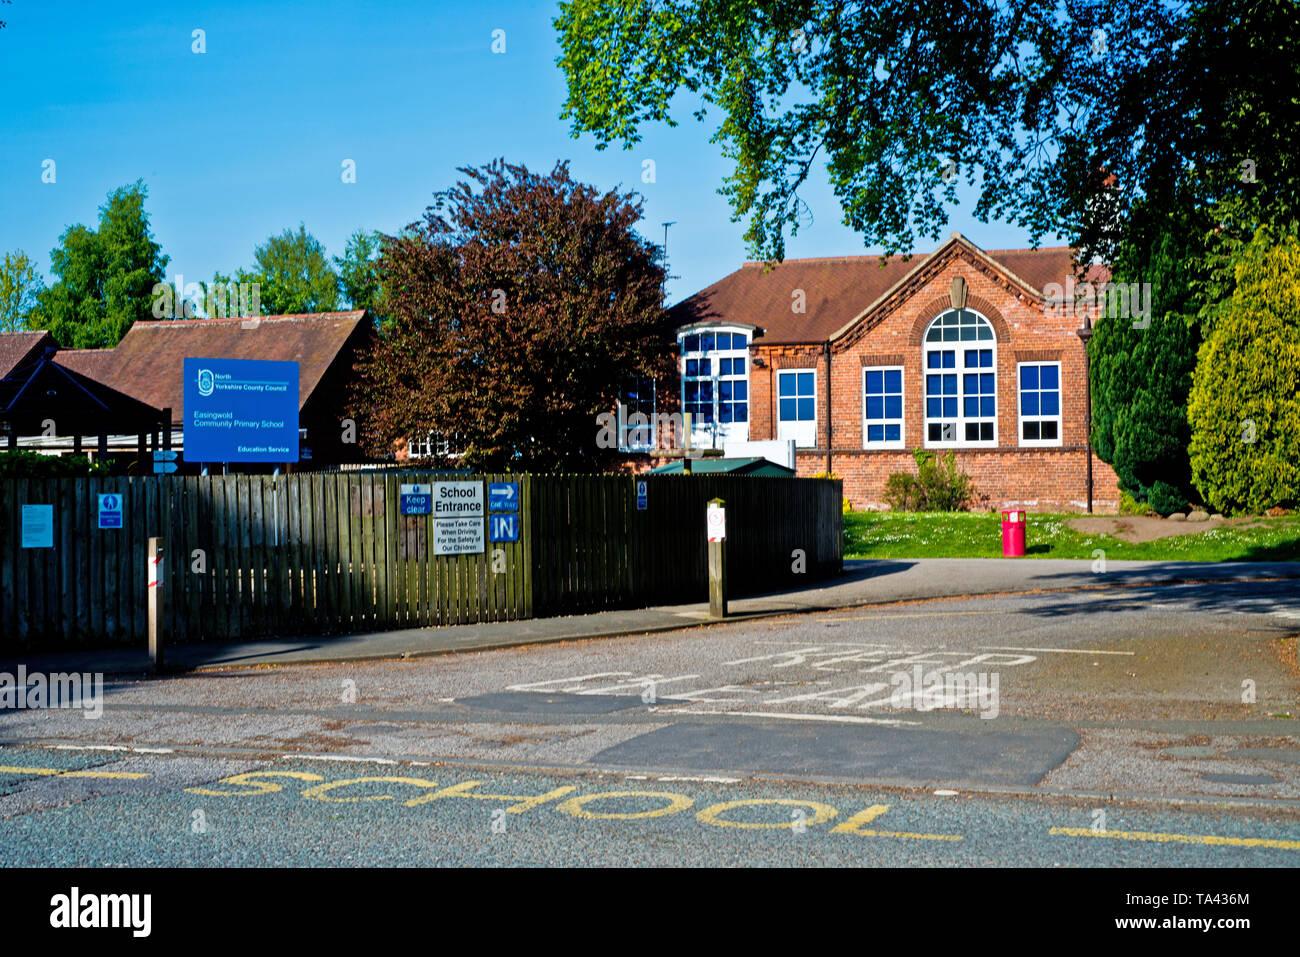 Communauté Easingwold Easingwold, école primaire, North Yorkshire, Angleterre Photo Stock